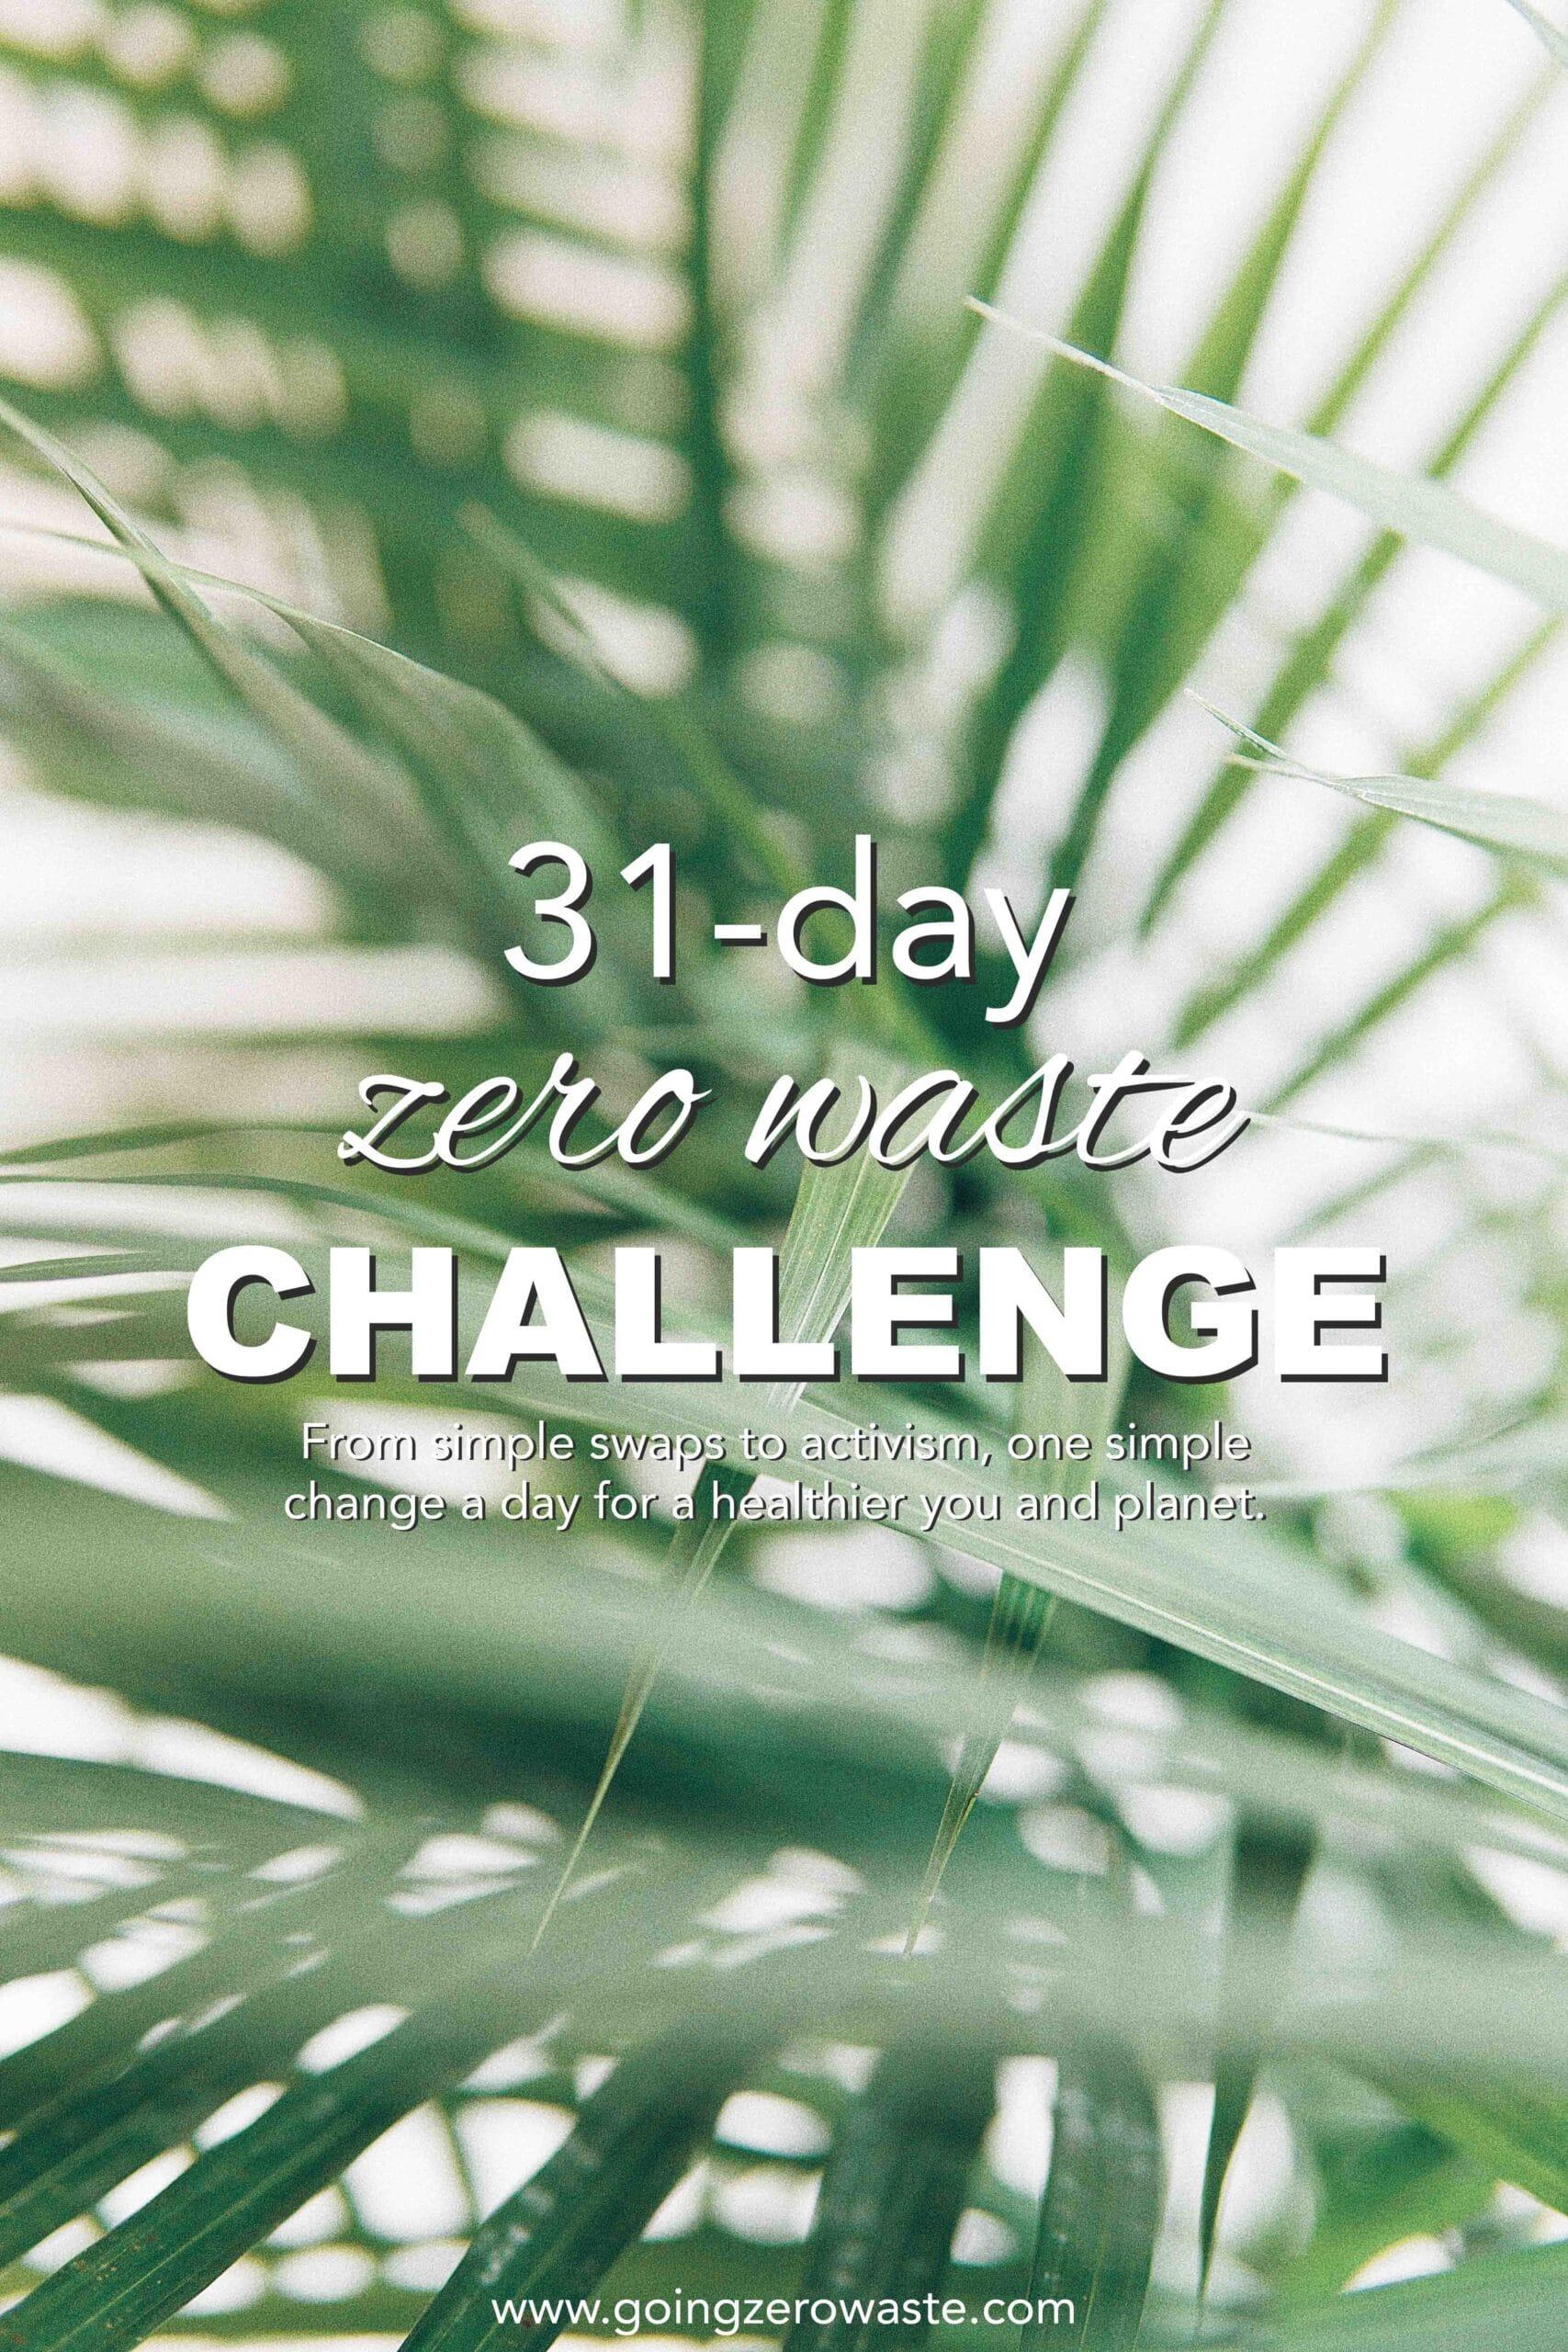 31 Day Zero Waste Challenge from www.goingzerowaste.com #zerowaste #ecofriendly #gogreen #sustainable #zerowastechallenge #challenge #sustainablelivingchallenge